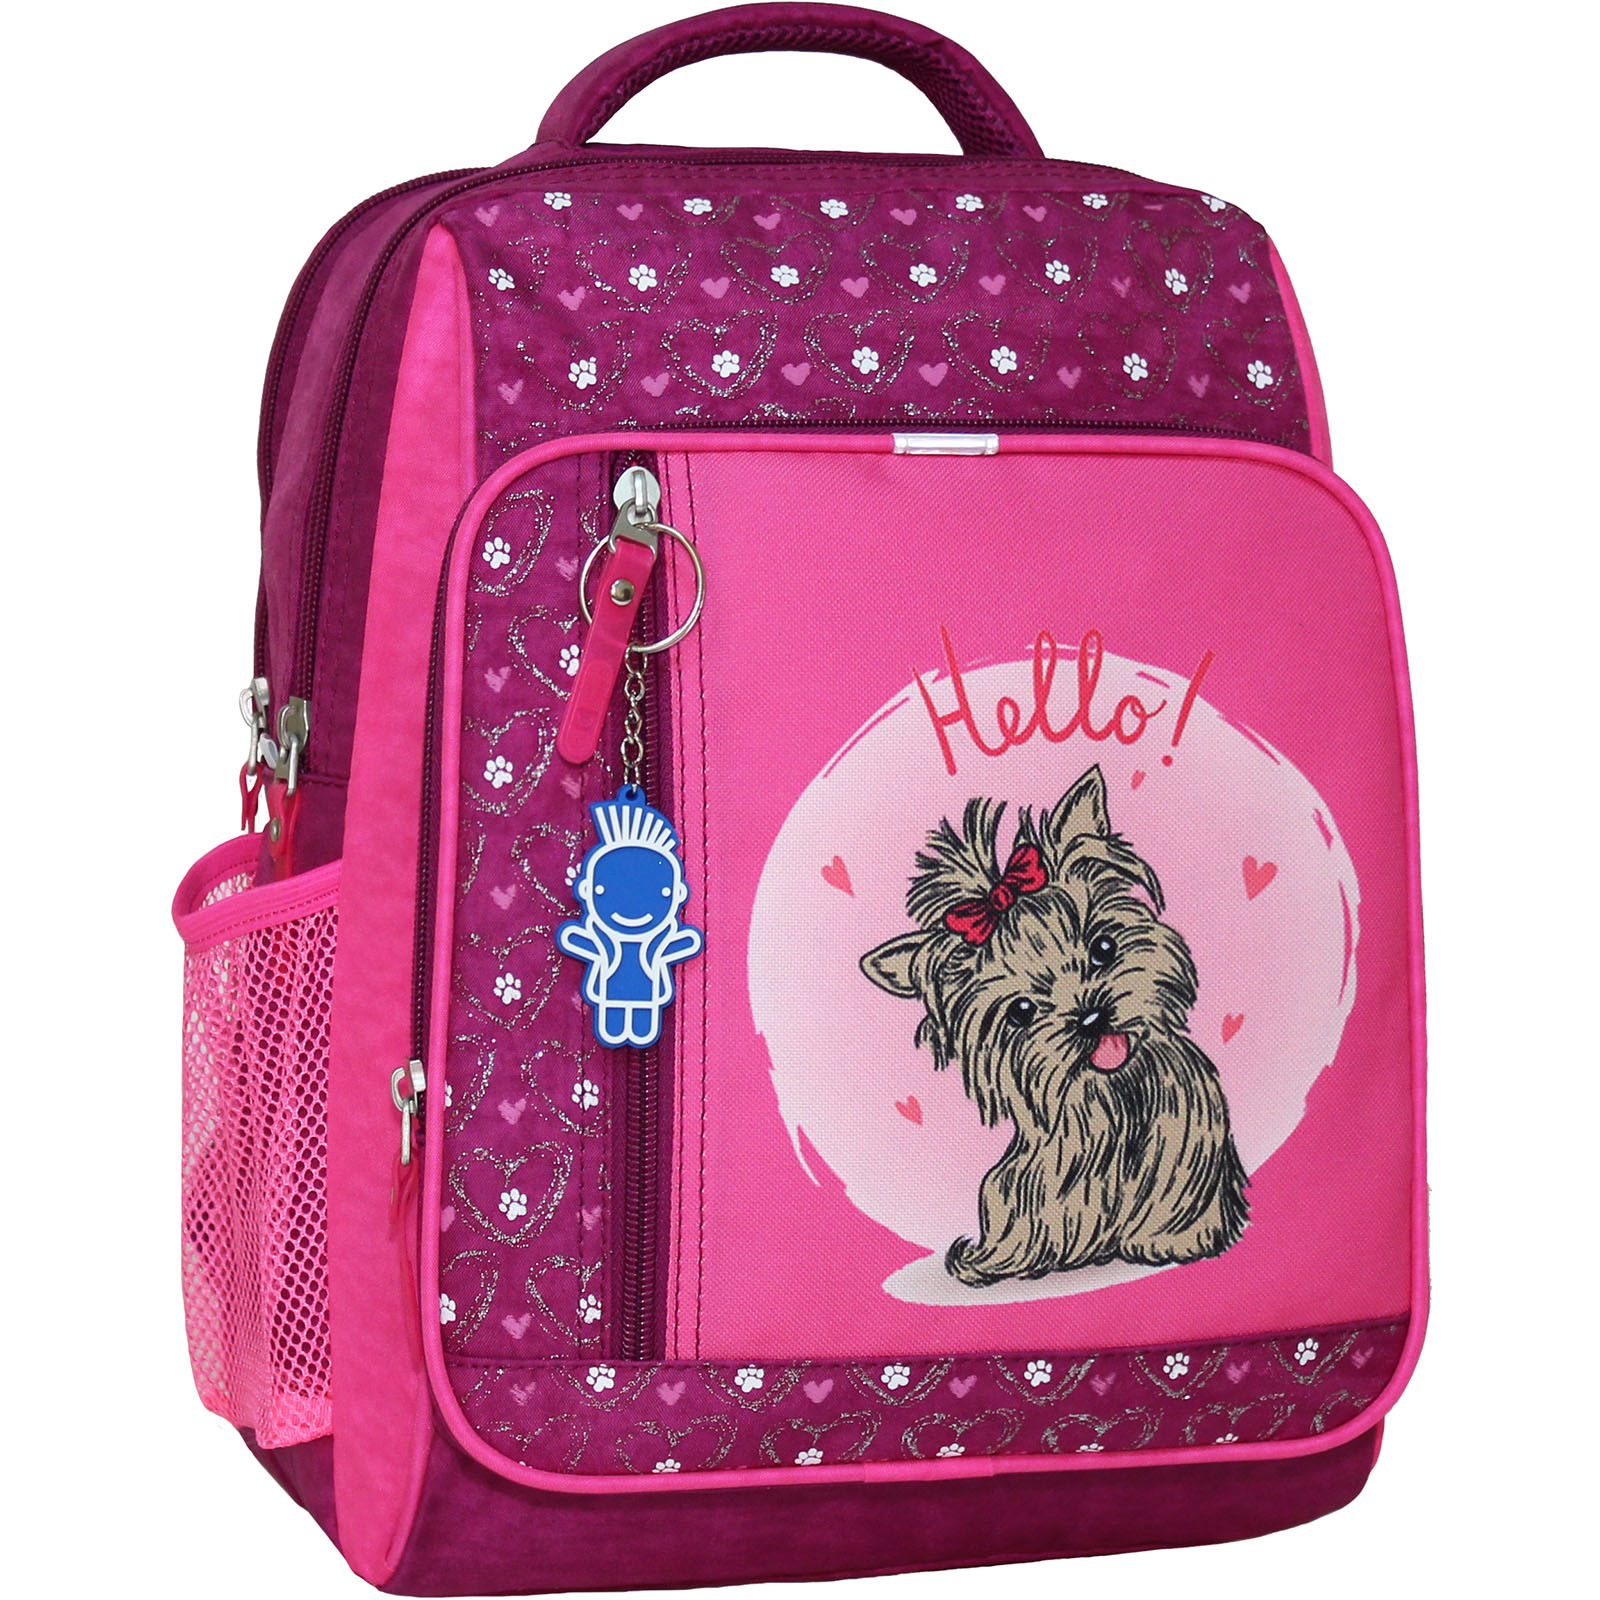 Школьные рюкзаки Рюкзак школьный Bagland Школьник 8 л. 143 малина 167к (00112702) IMG_6428_167К_.JPG